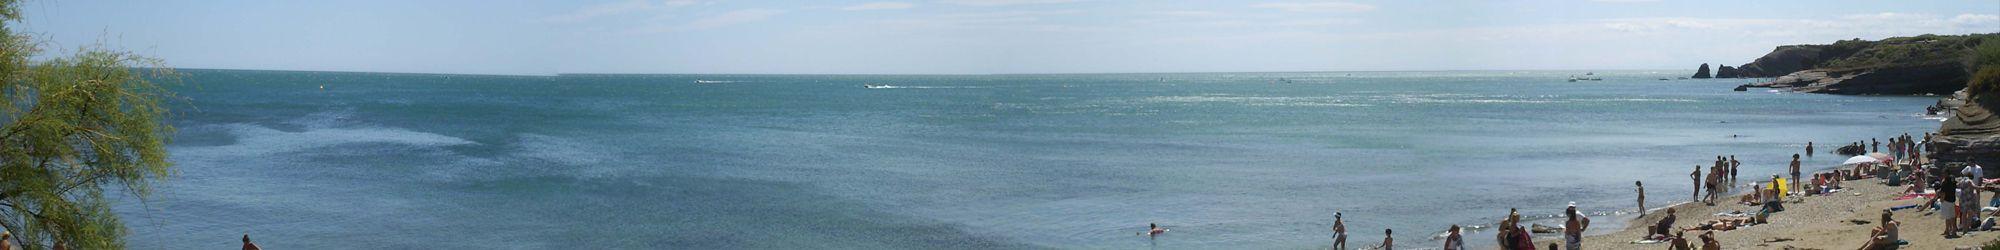 Front de mer au Cap d'Agde